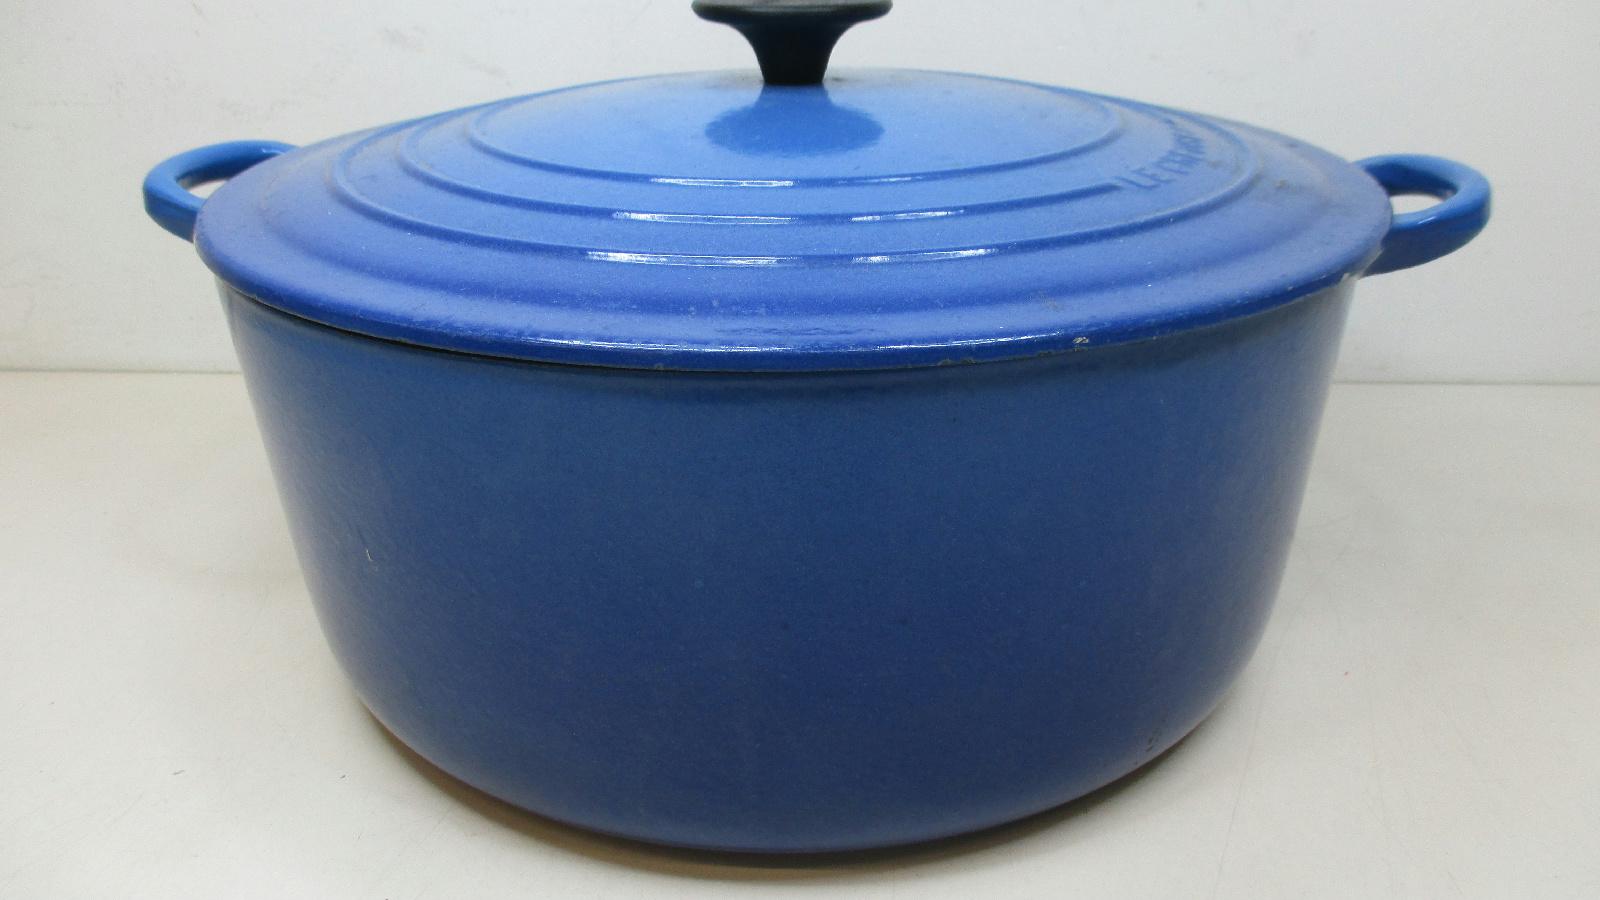 le creuset cobalt blue enamel cast iron dutch oven soup pot with lid france 30 ebay. Black Bedroom Furniture Sets. Home Design Ideas